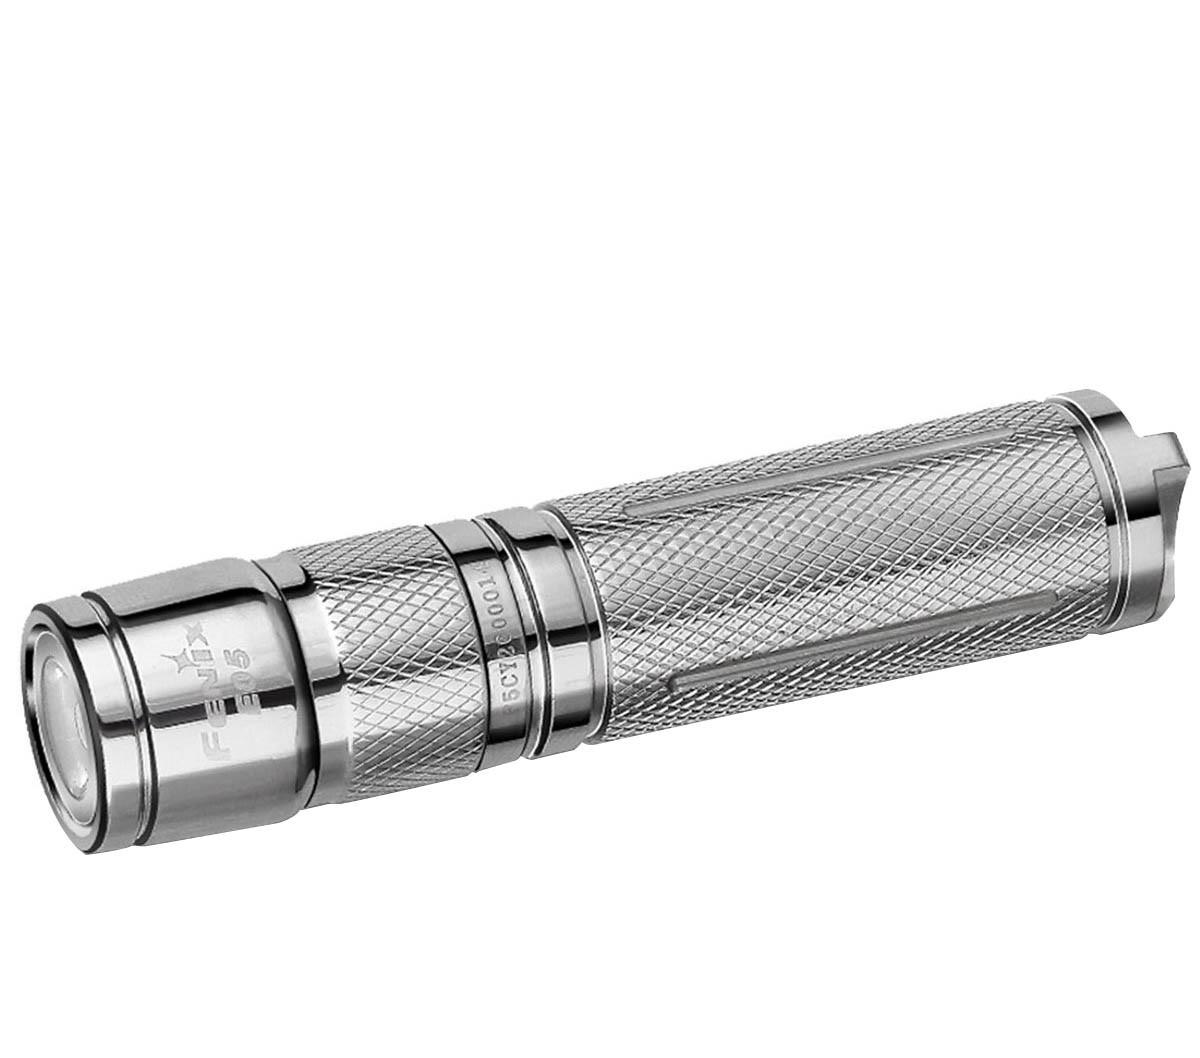 Fenix E05ss Stainless Steel  85 Lumens LED Key Chain EDC Flashlight